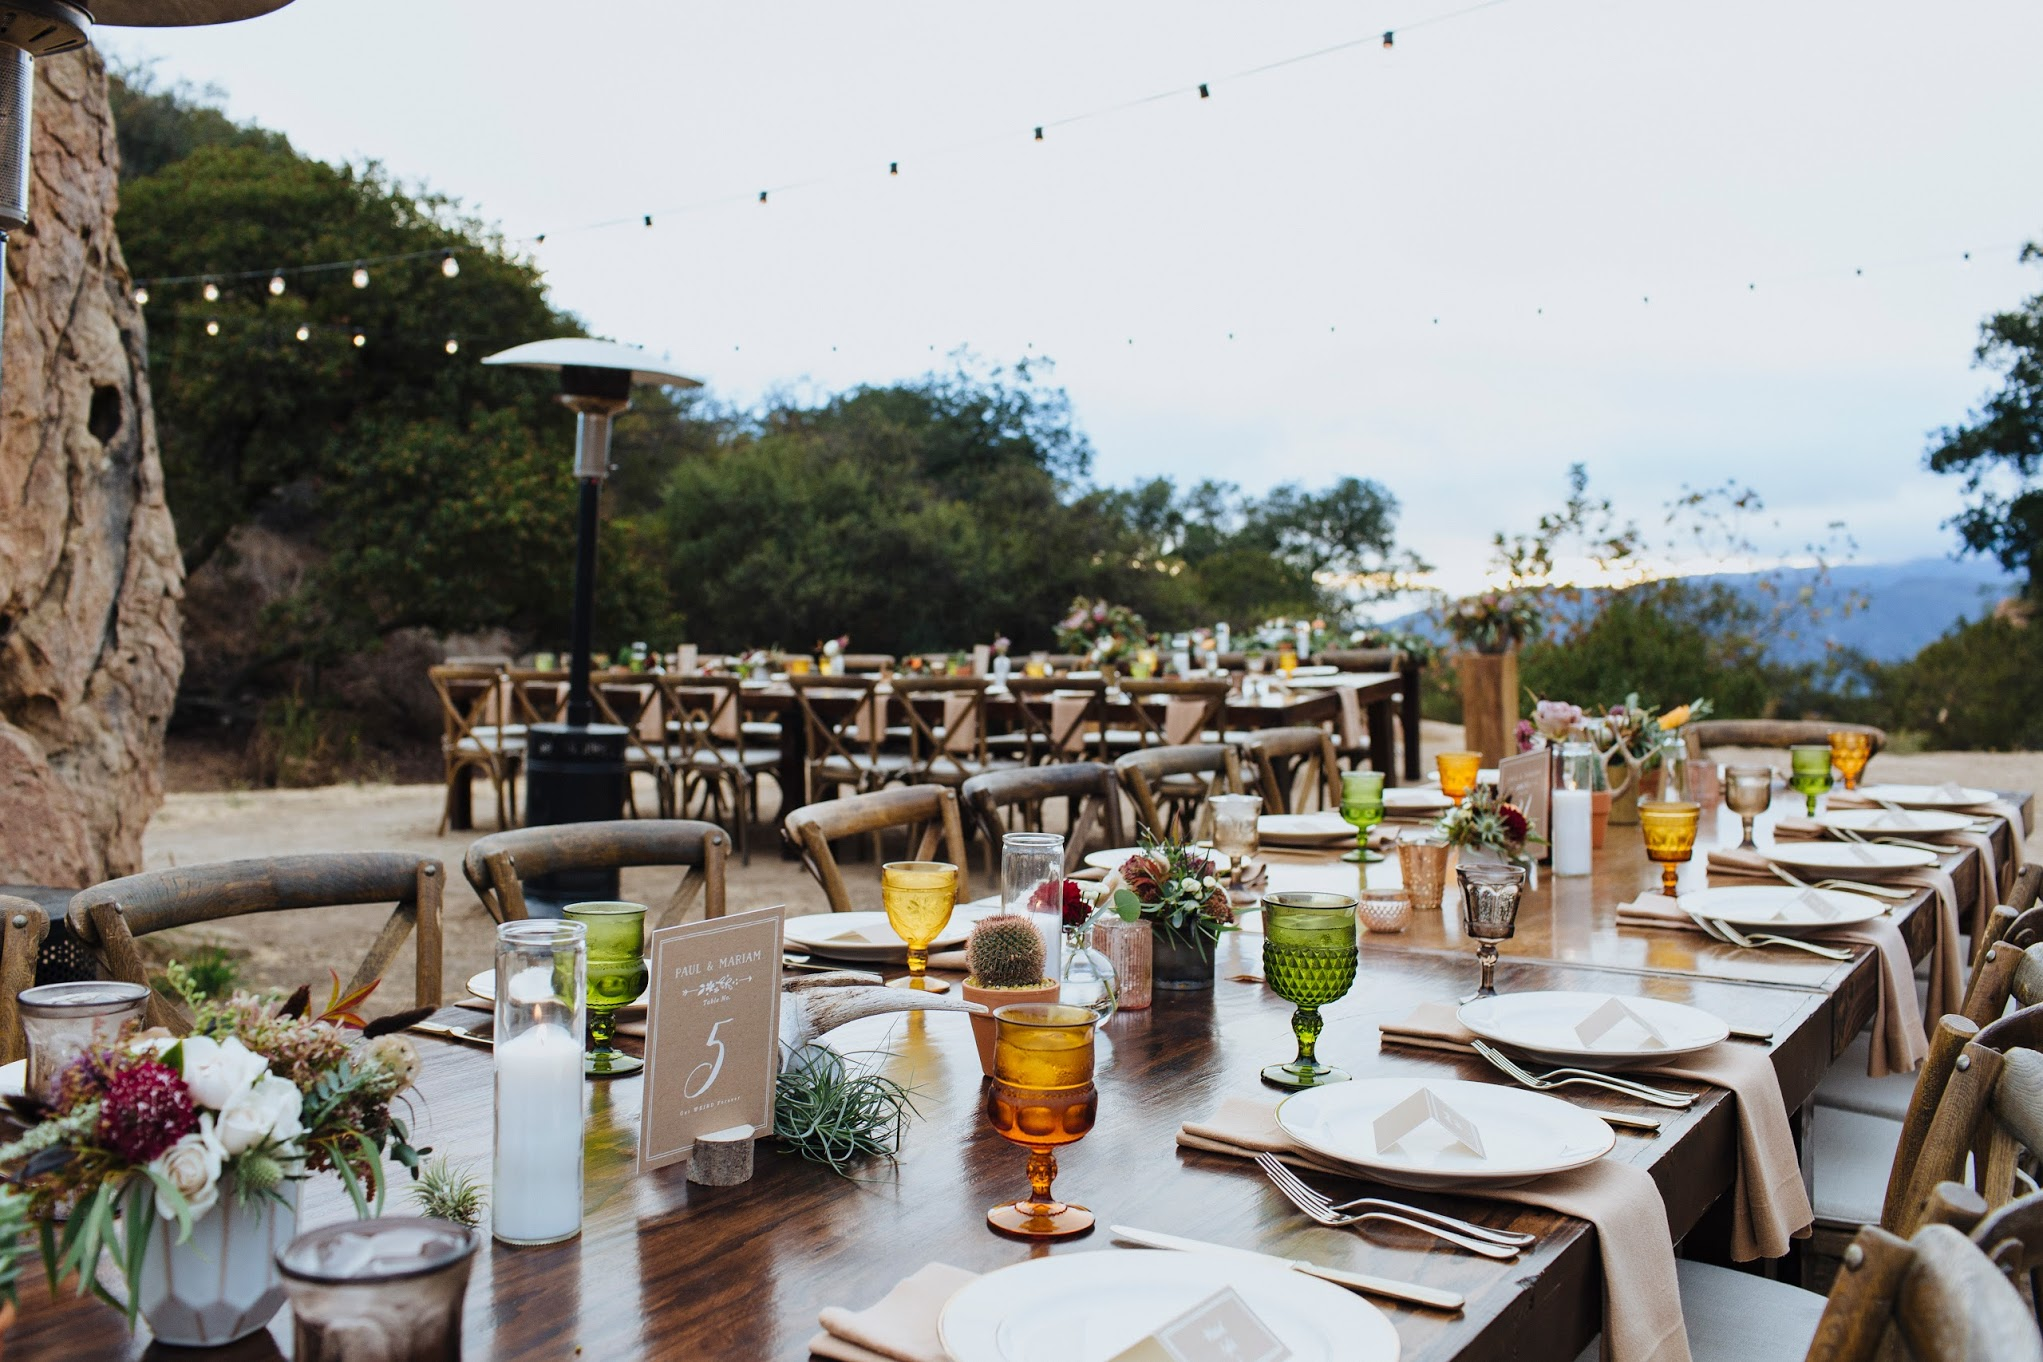 radandinlove_mariamandpaul_469 catering san diego wedding catering